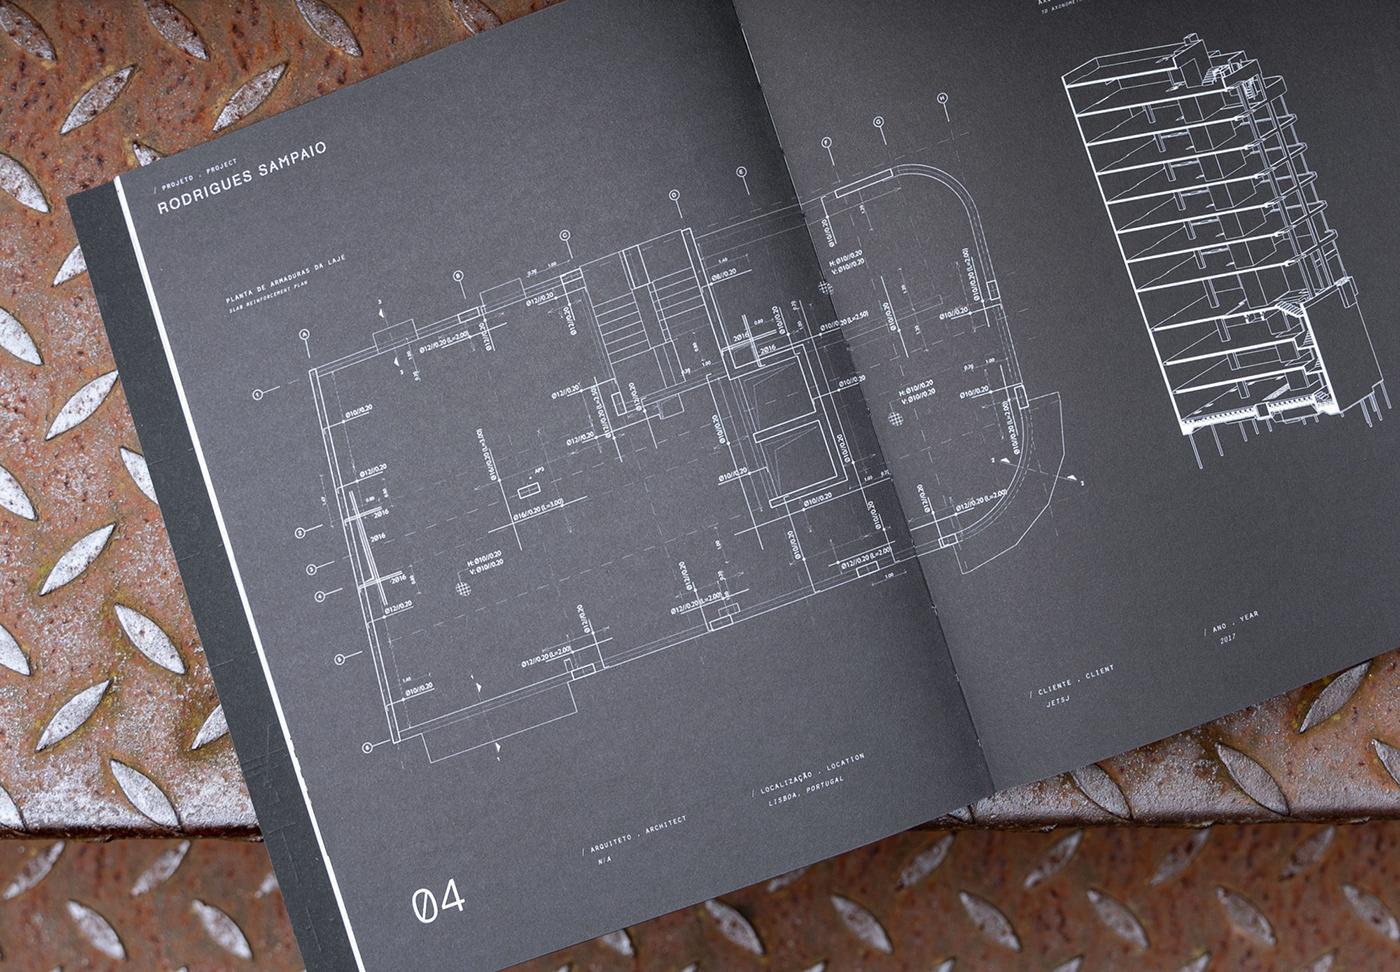 architecture book casestudies editorial Engineering  portfolio print publication typography